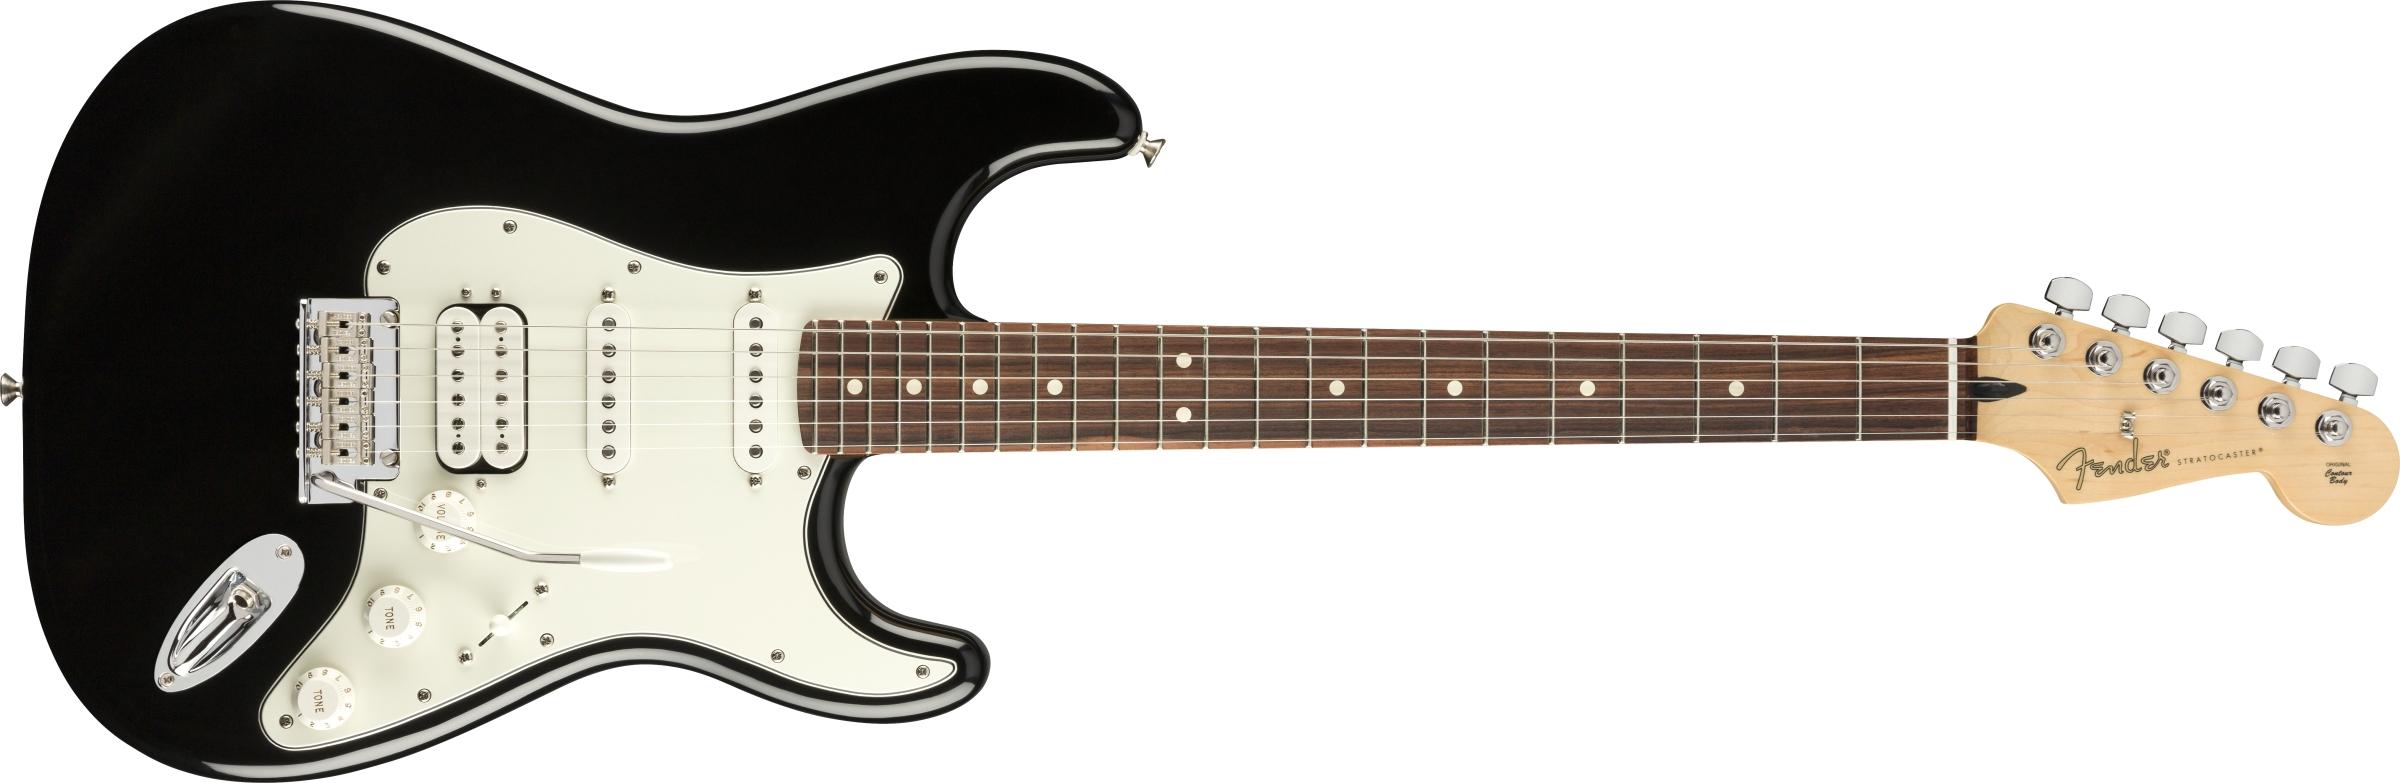 FENDER-Player-Stratocaster-HSS-PF-Black-0144523506-sku-24301